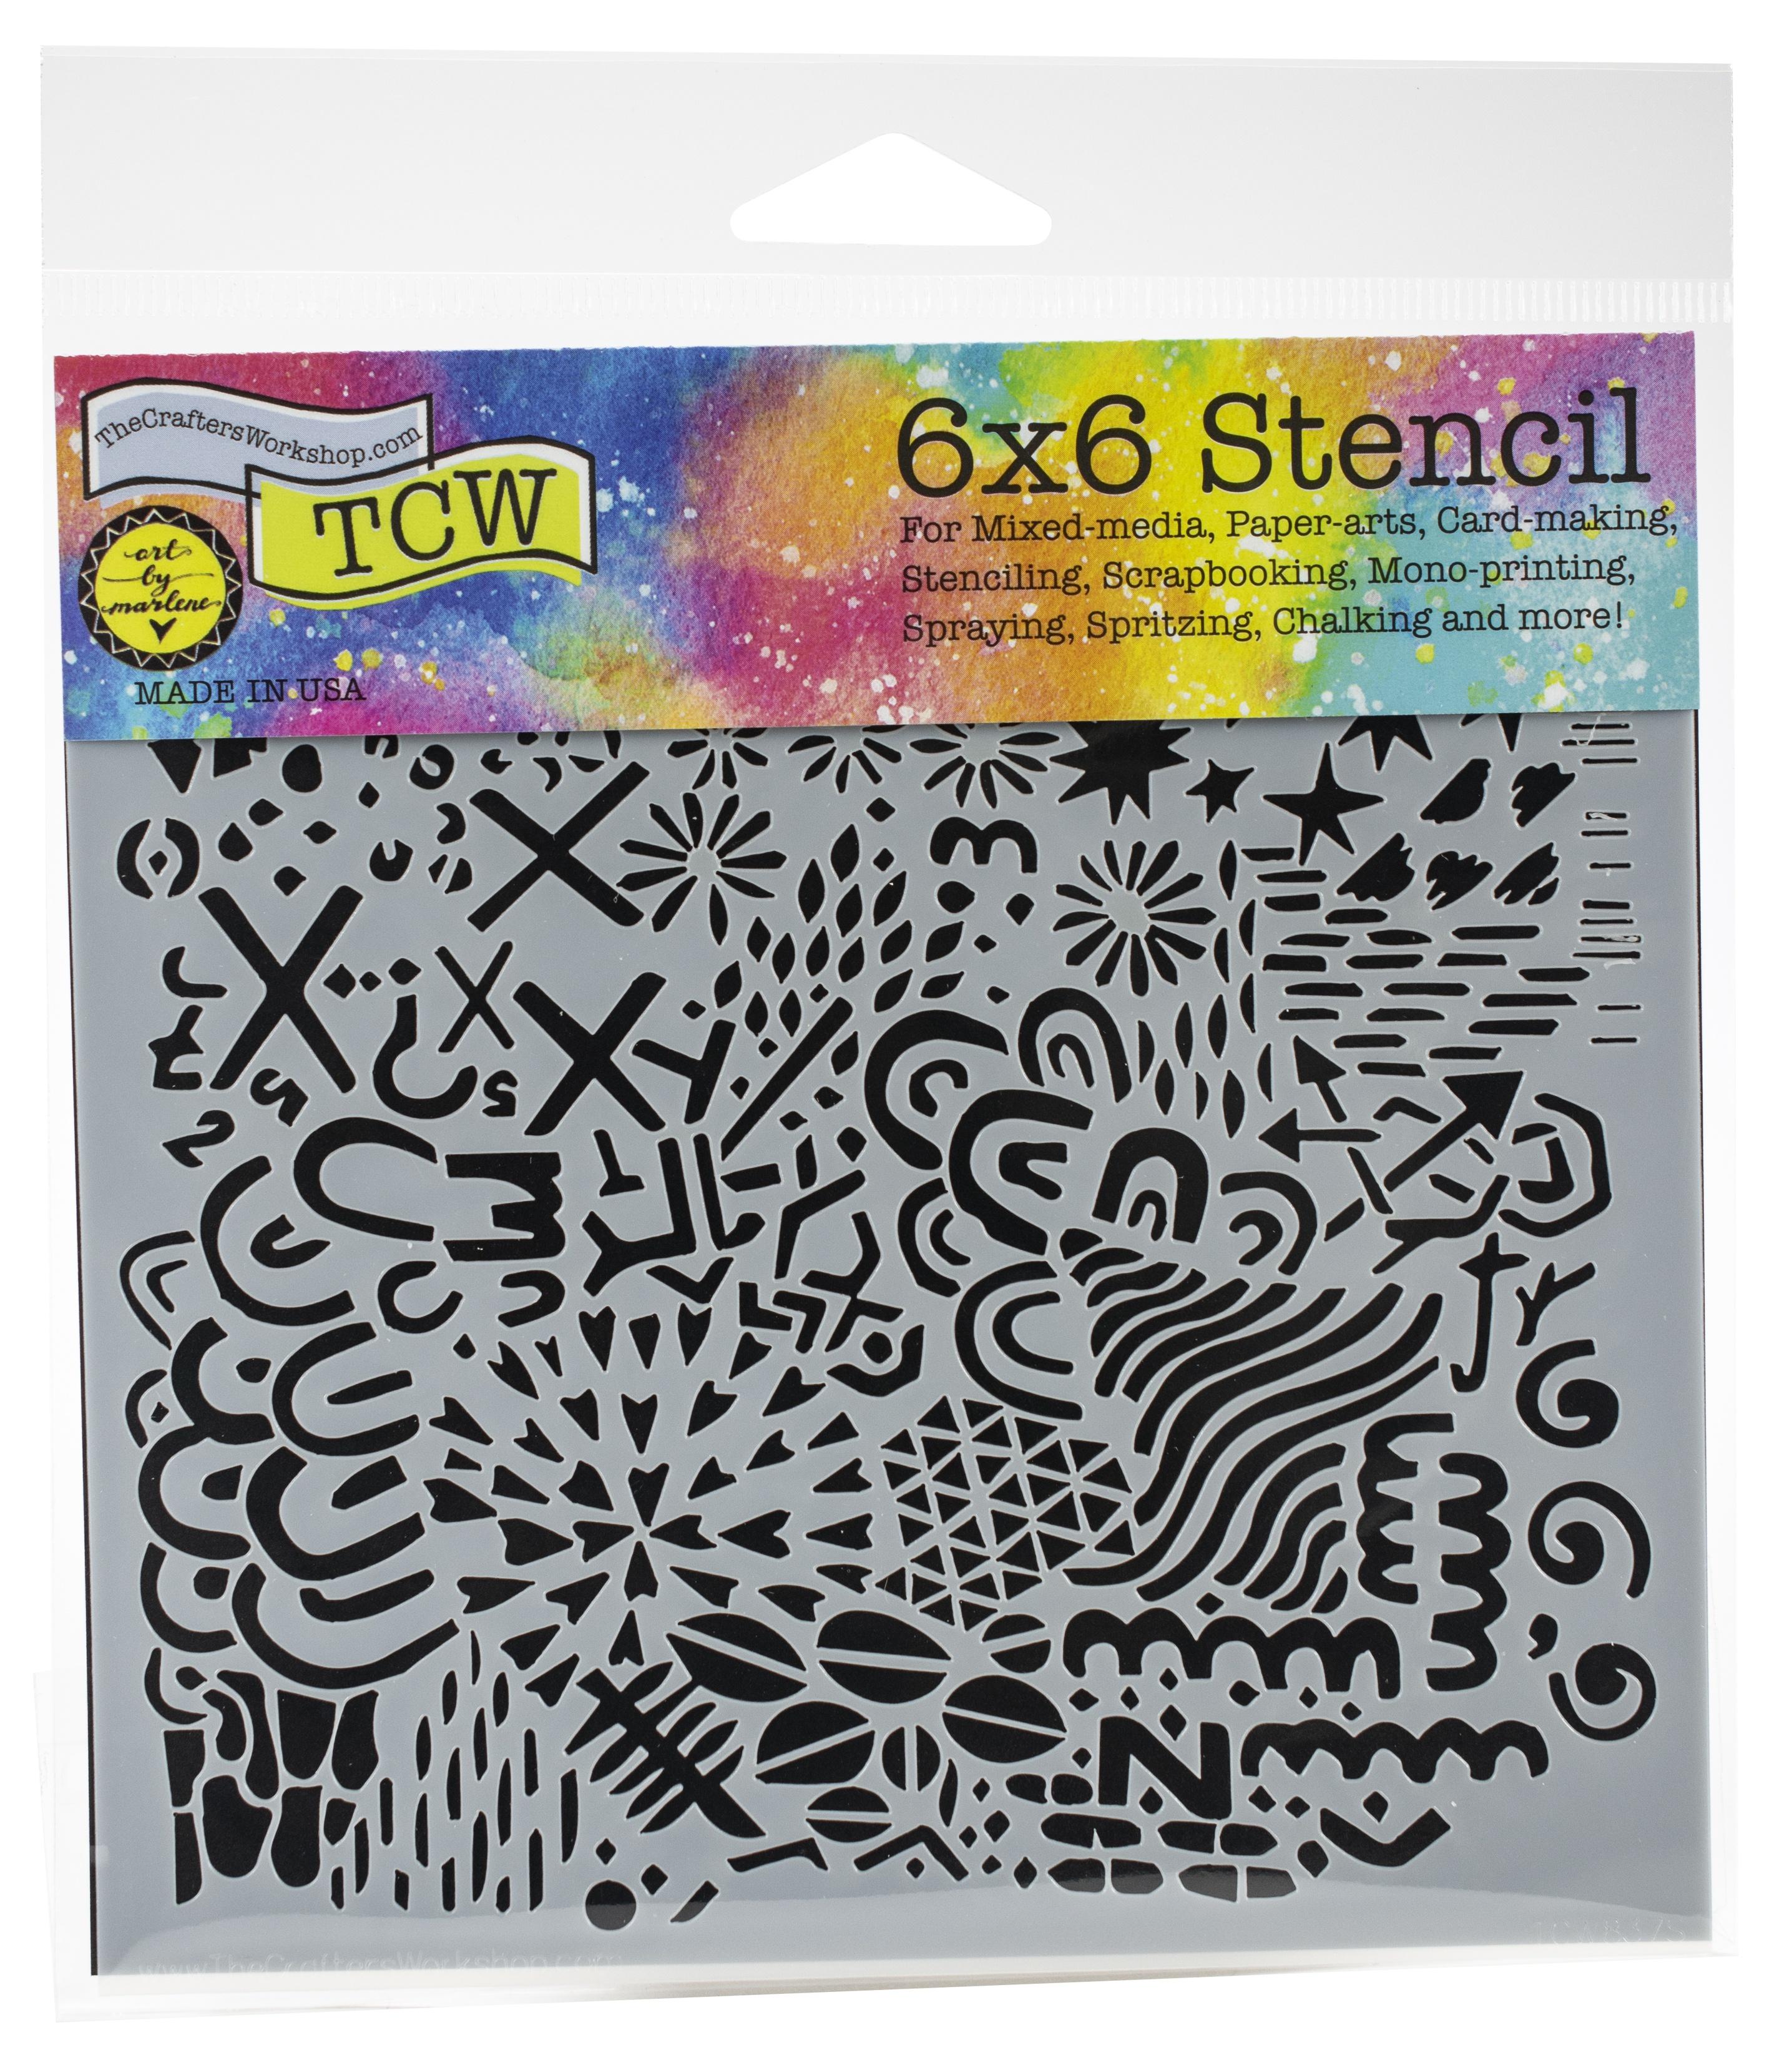 Texture Plate 6x6 Stencil